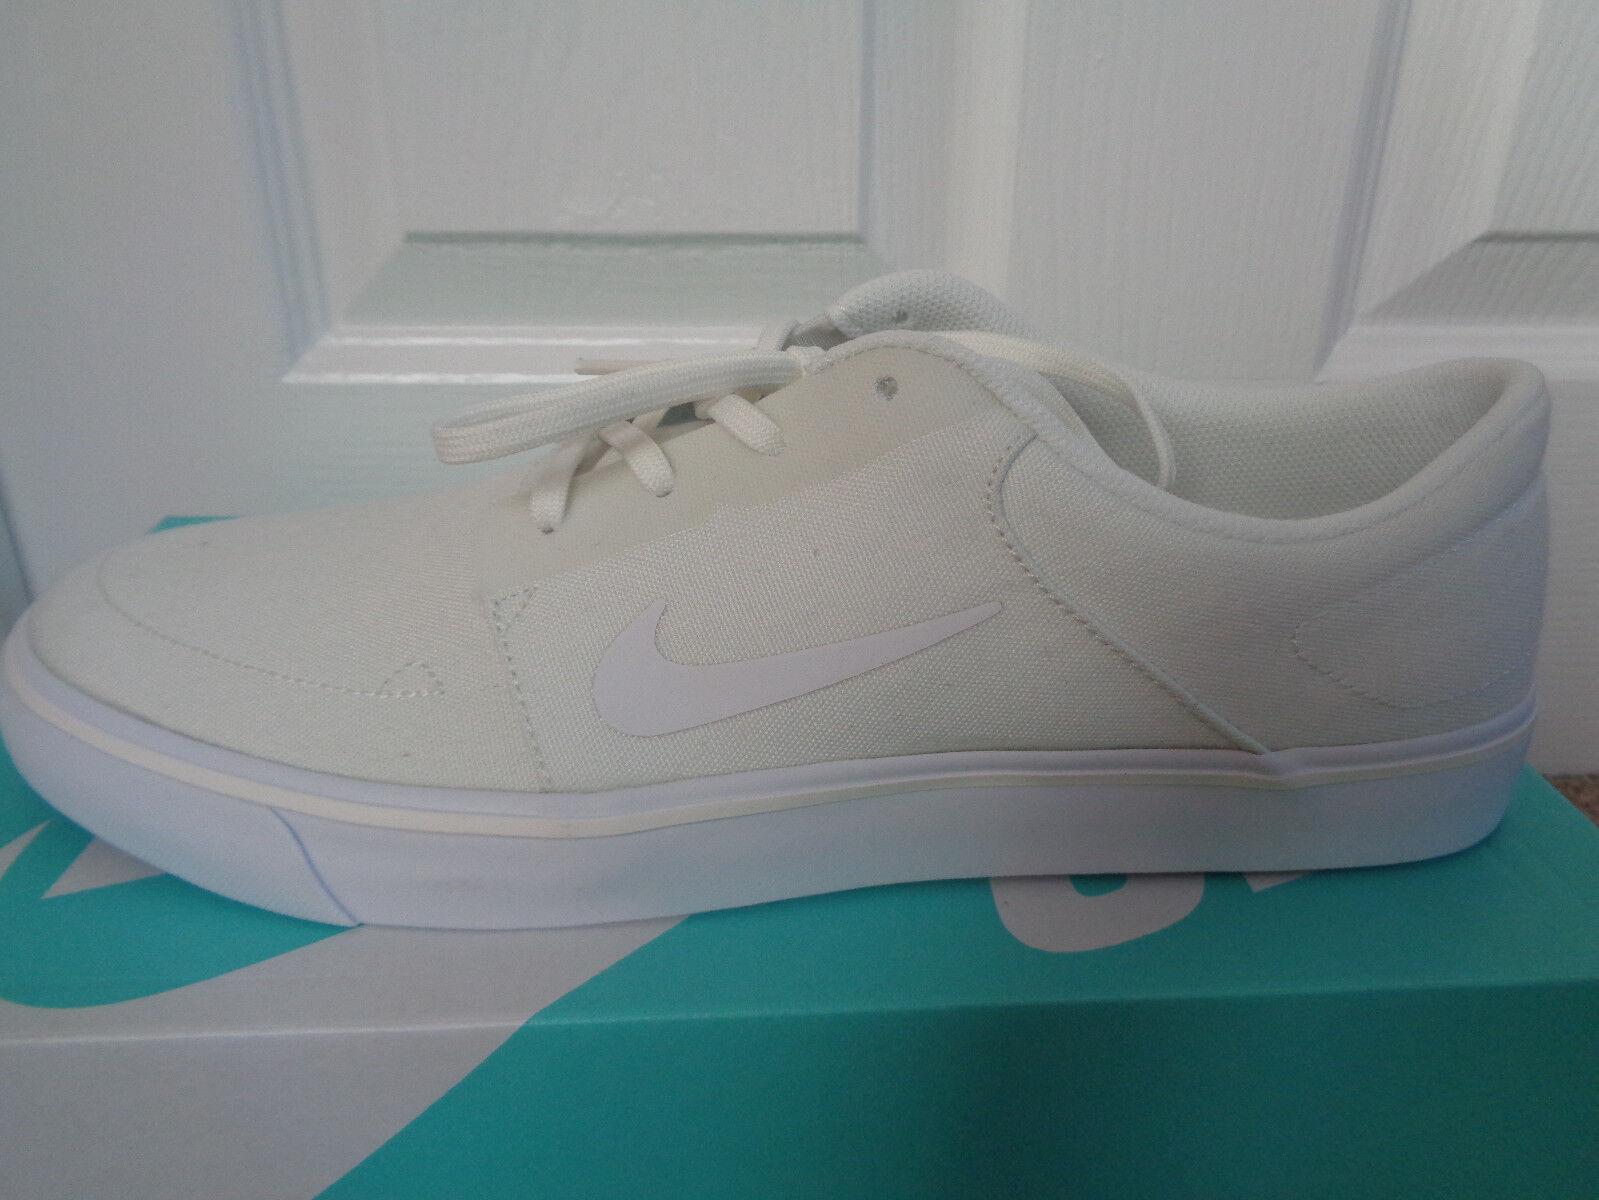 new arrival 2db14 56e7f Nike Nike Nike SB Portmore Baskets Homme Chaussures 723874 111 US 10 NEUF +  bo?te 904542